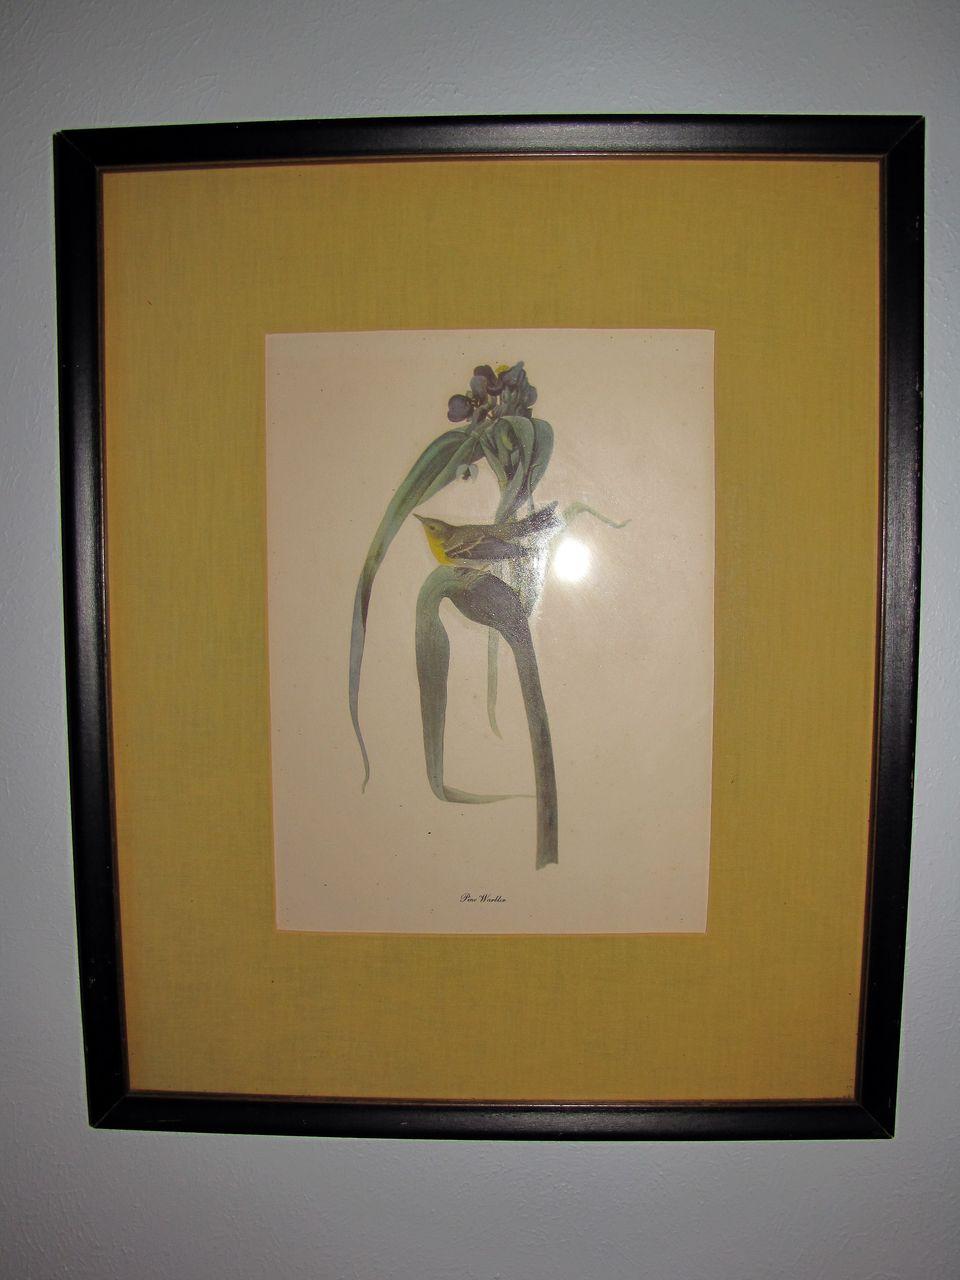 Lovely Framed and Matted Audubon Bird Print, PINE WARBLER